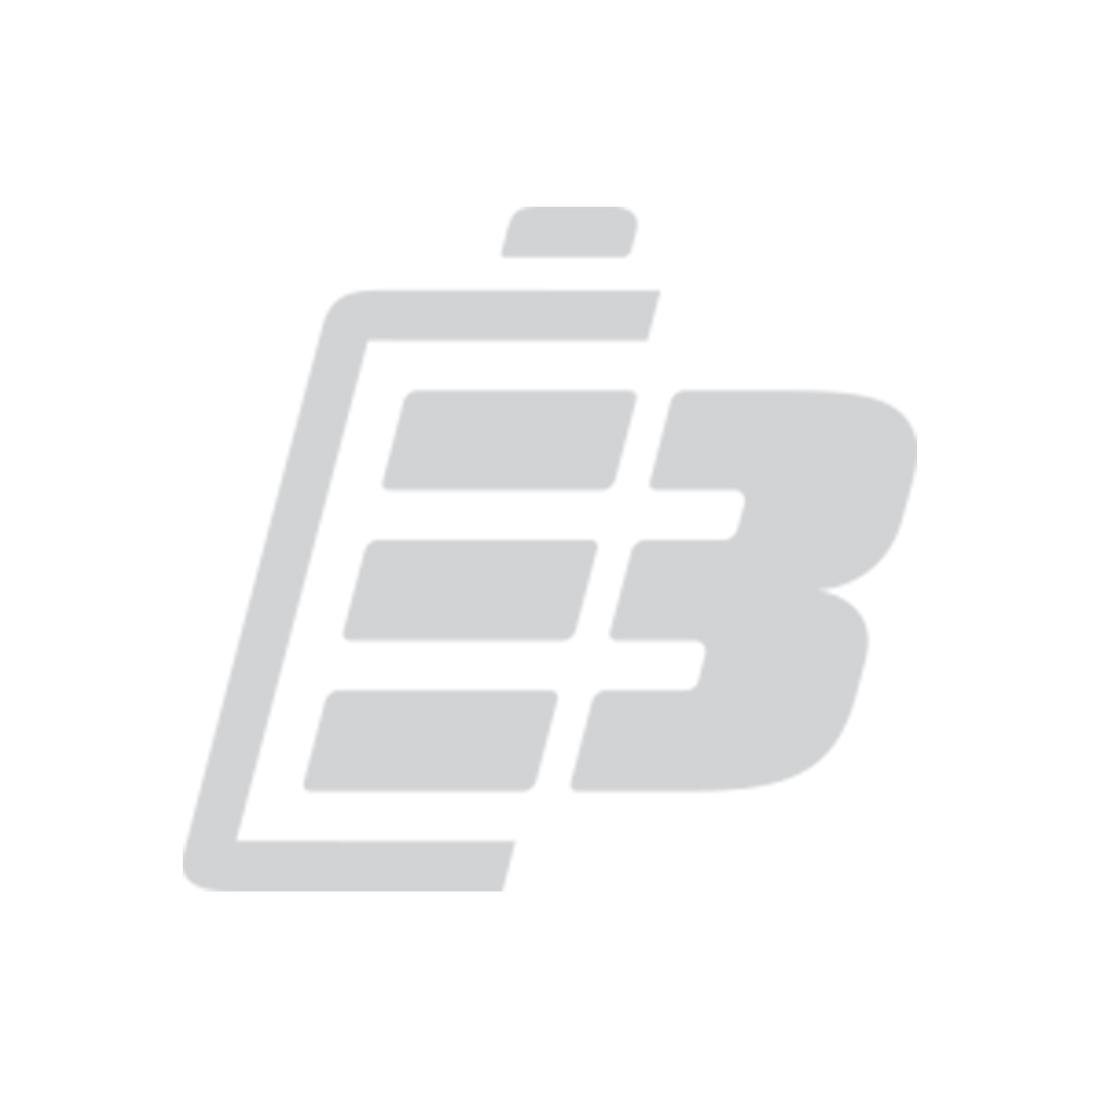 Duracell Industrial MN1203 D Alkaline battery 4.5V 1